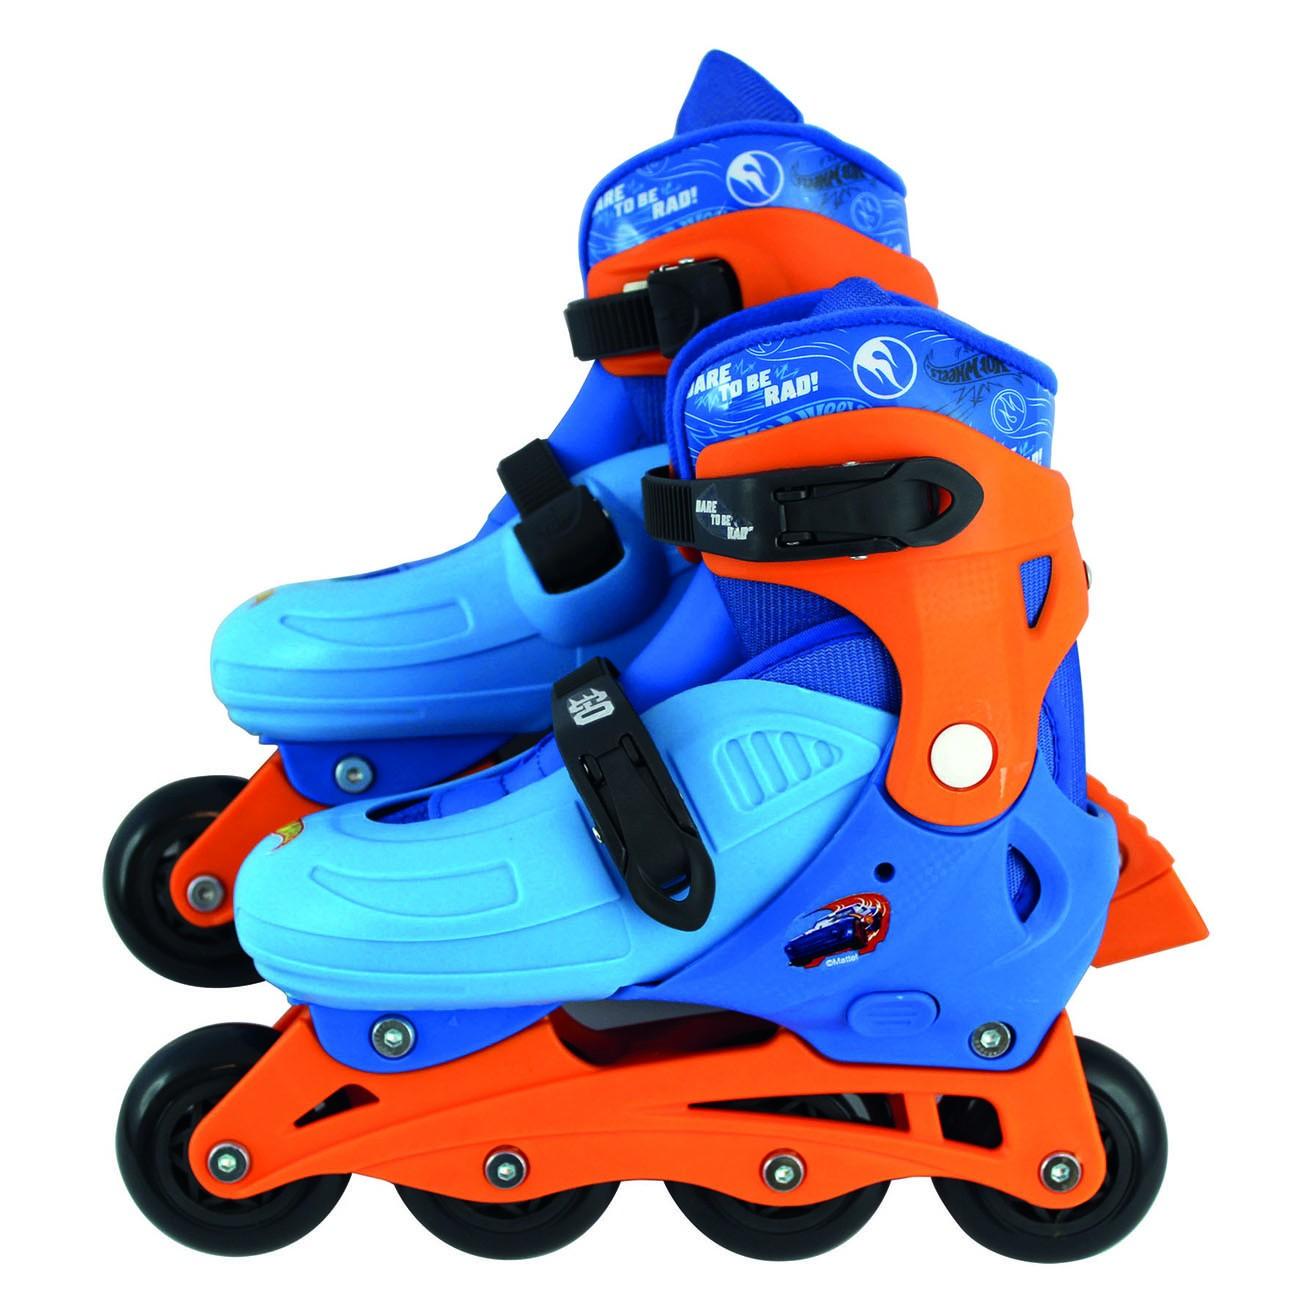 Hot Wheels Patins à Roulettes - Taille S